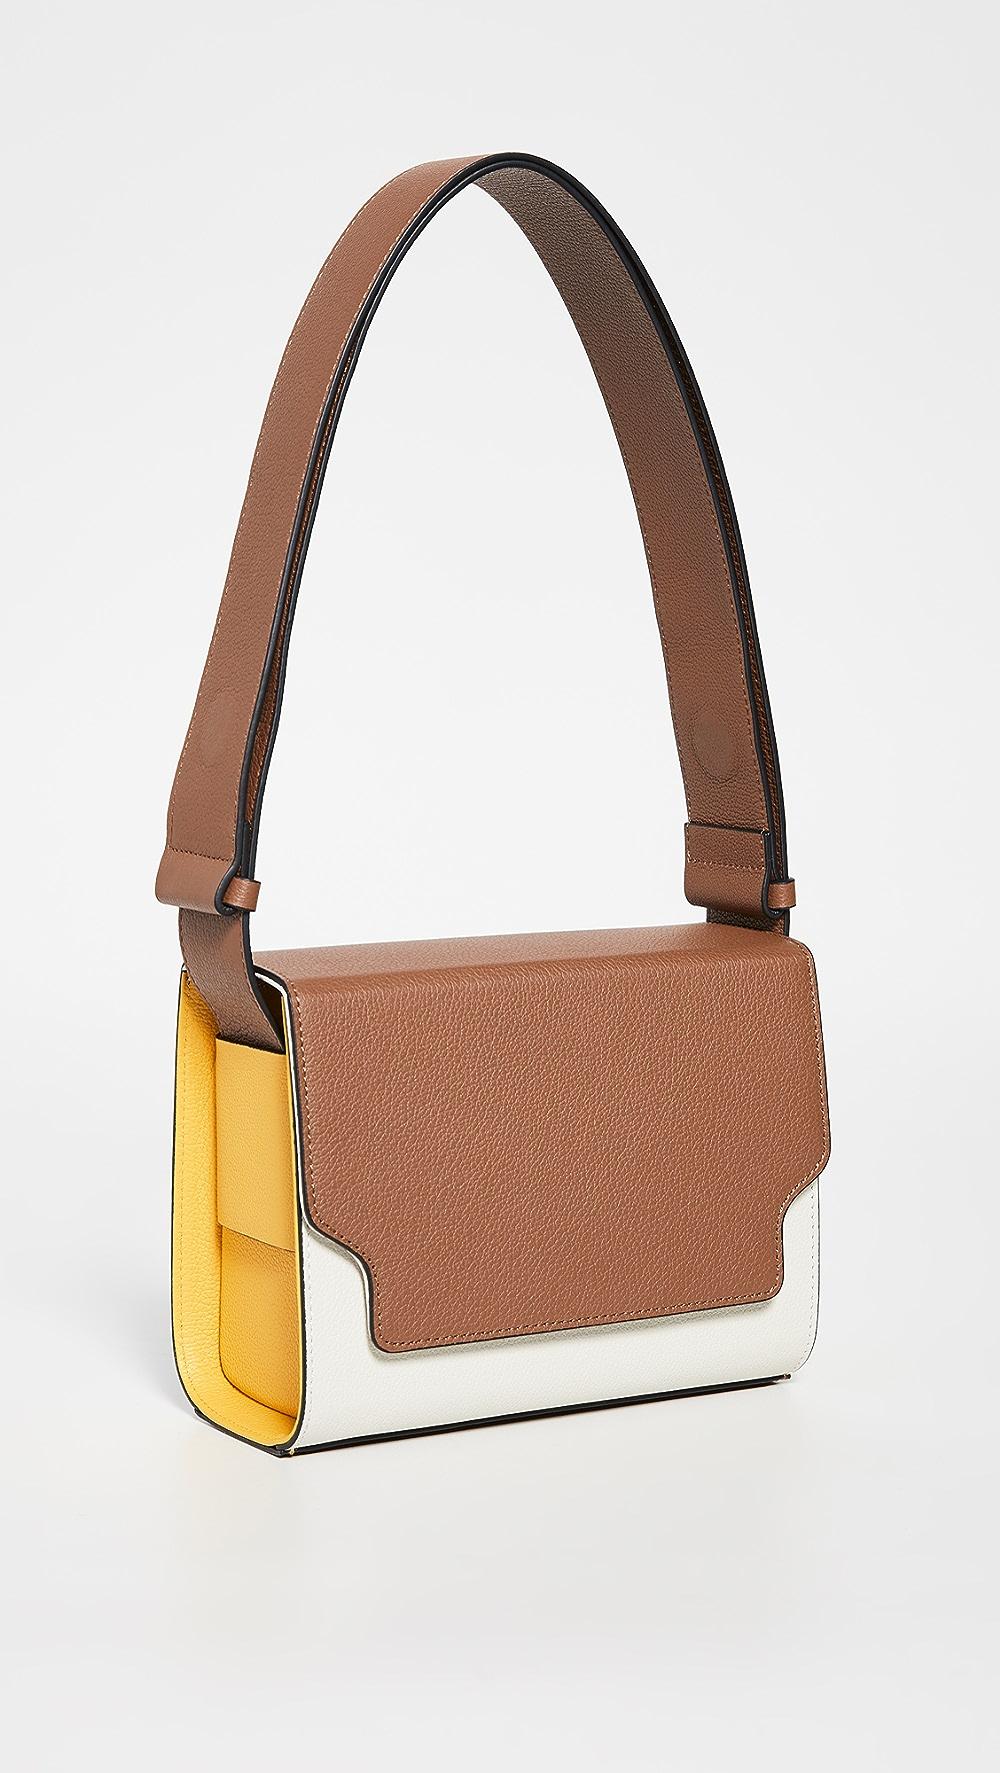 Honey Marge Sherwood - Vava Classic Bag Shrink-Proof